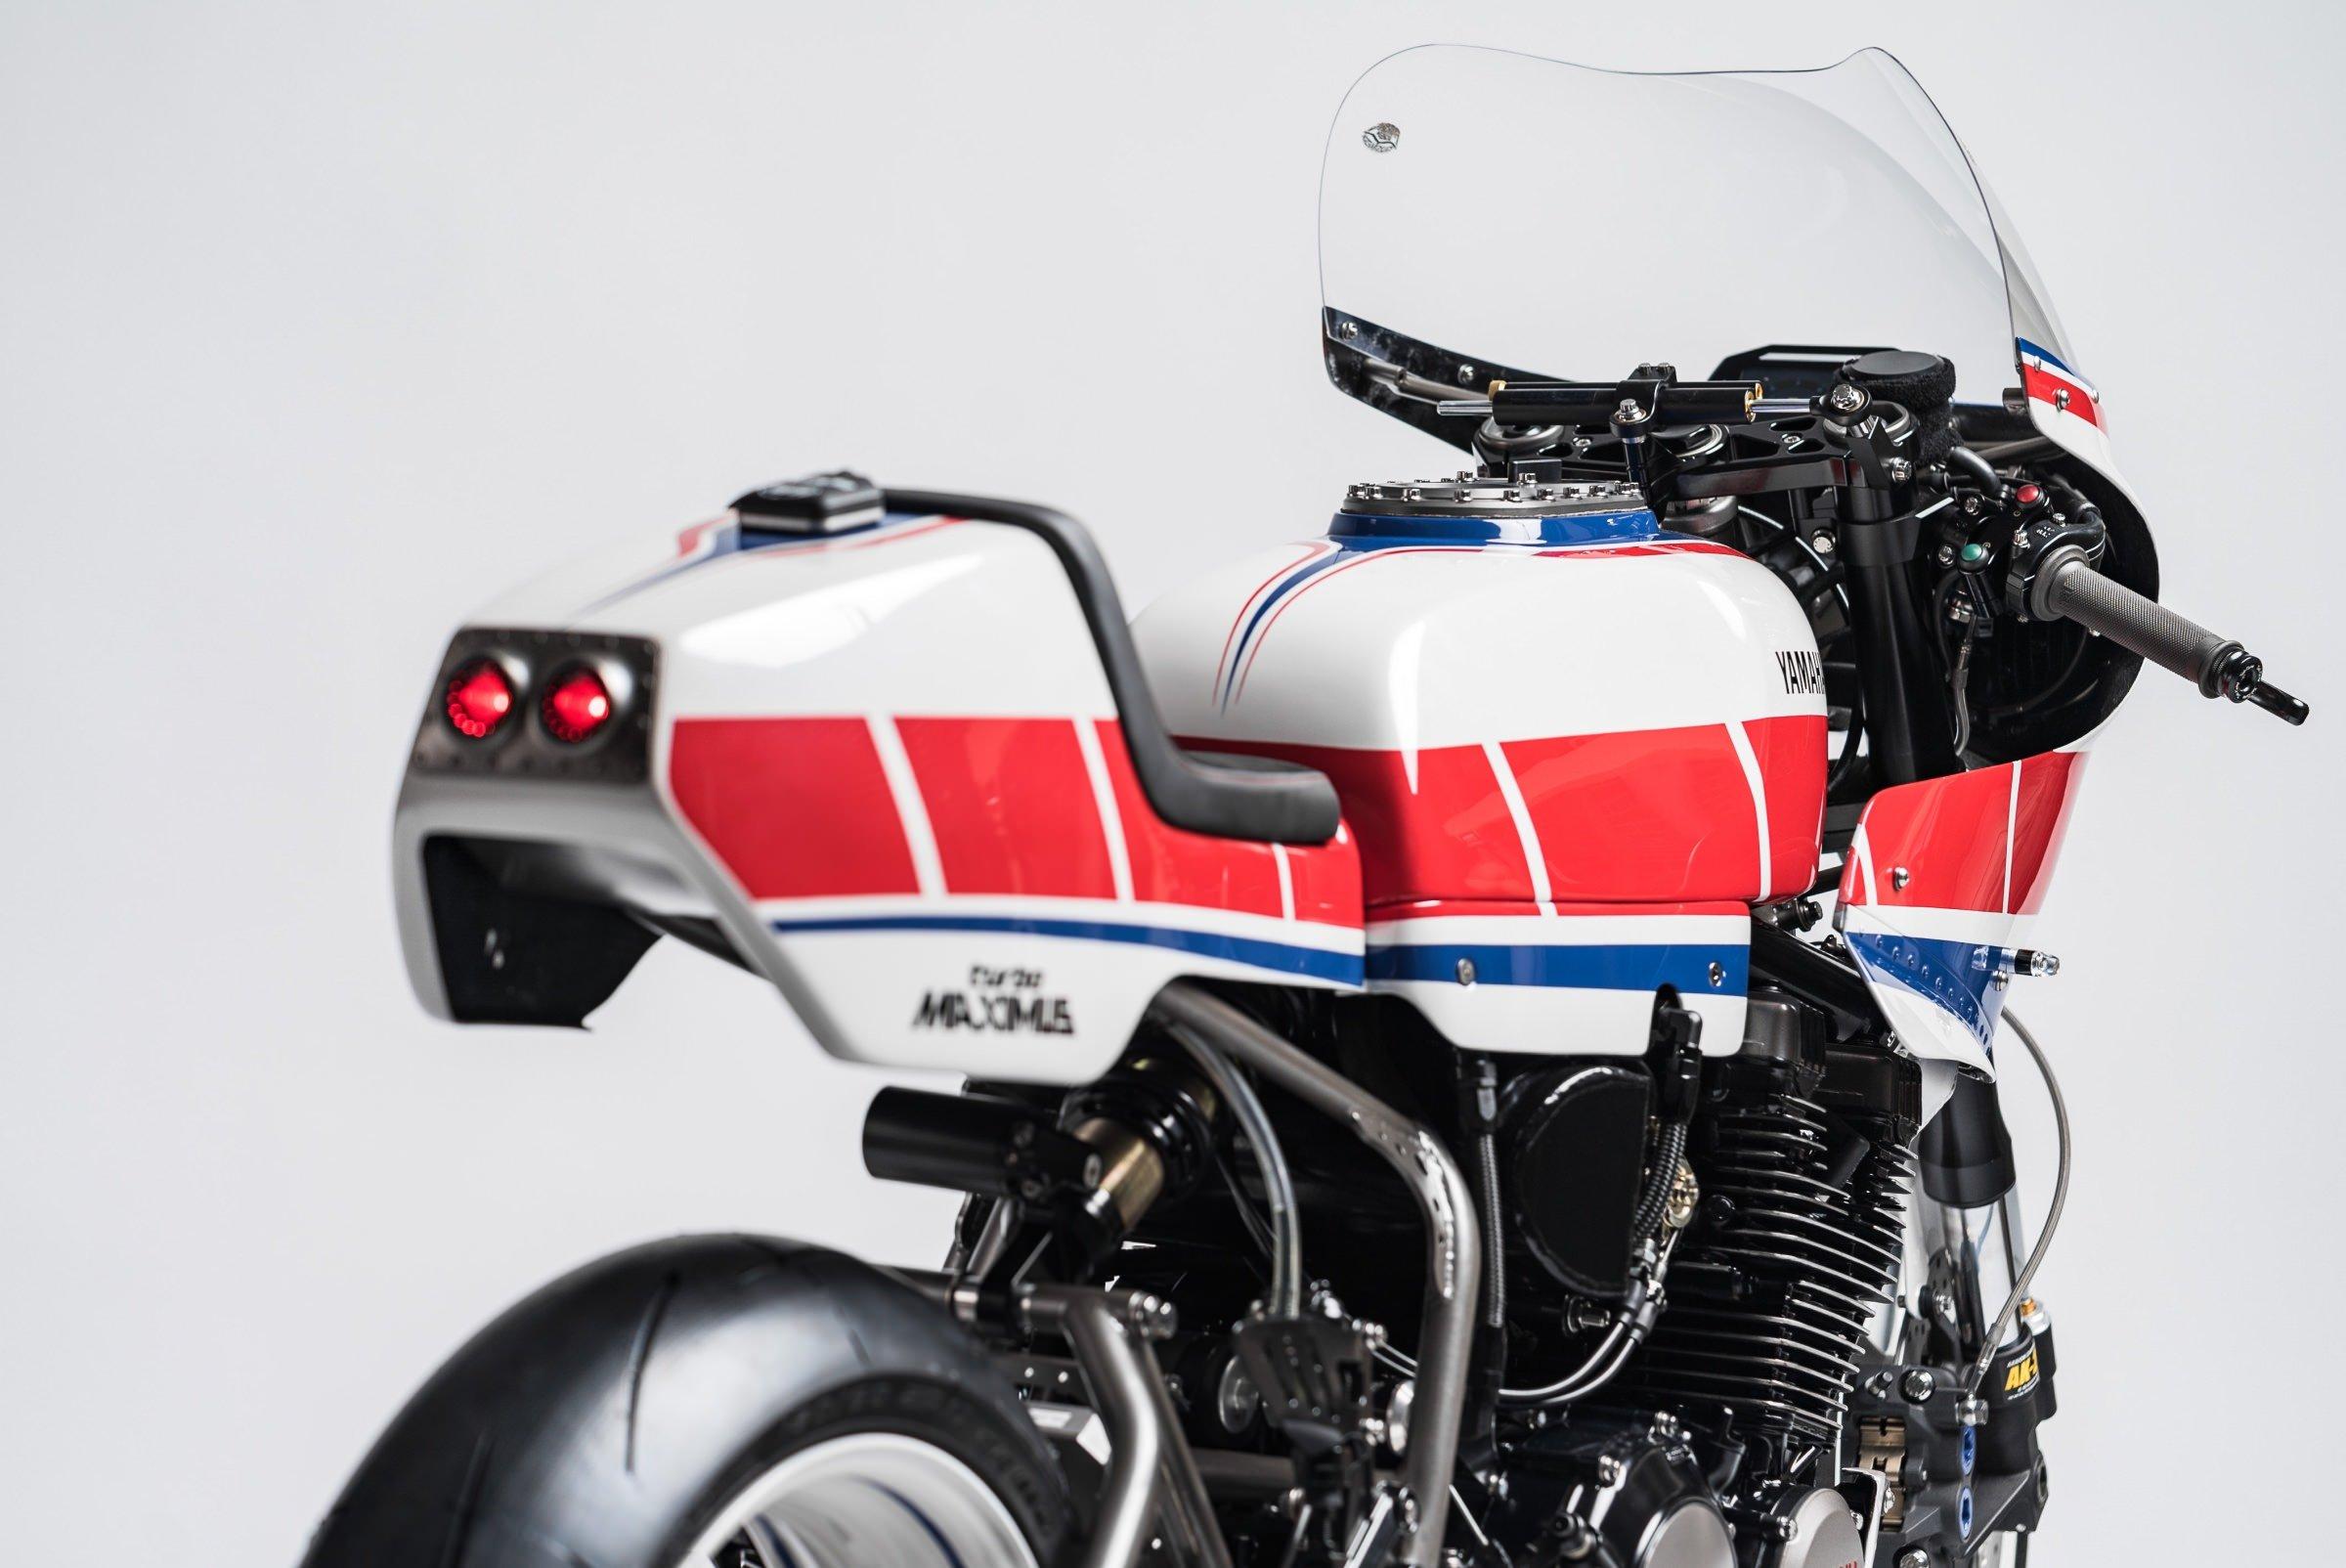 The Turbo Maximus - A 200 hp Turbocharged Yamaha by Derek Kimes